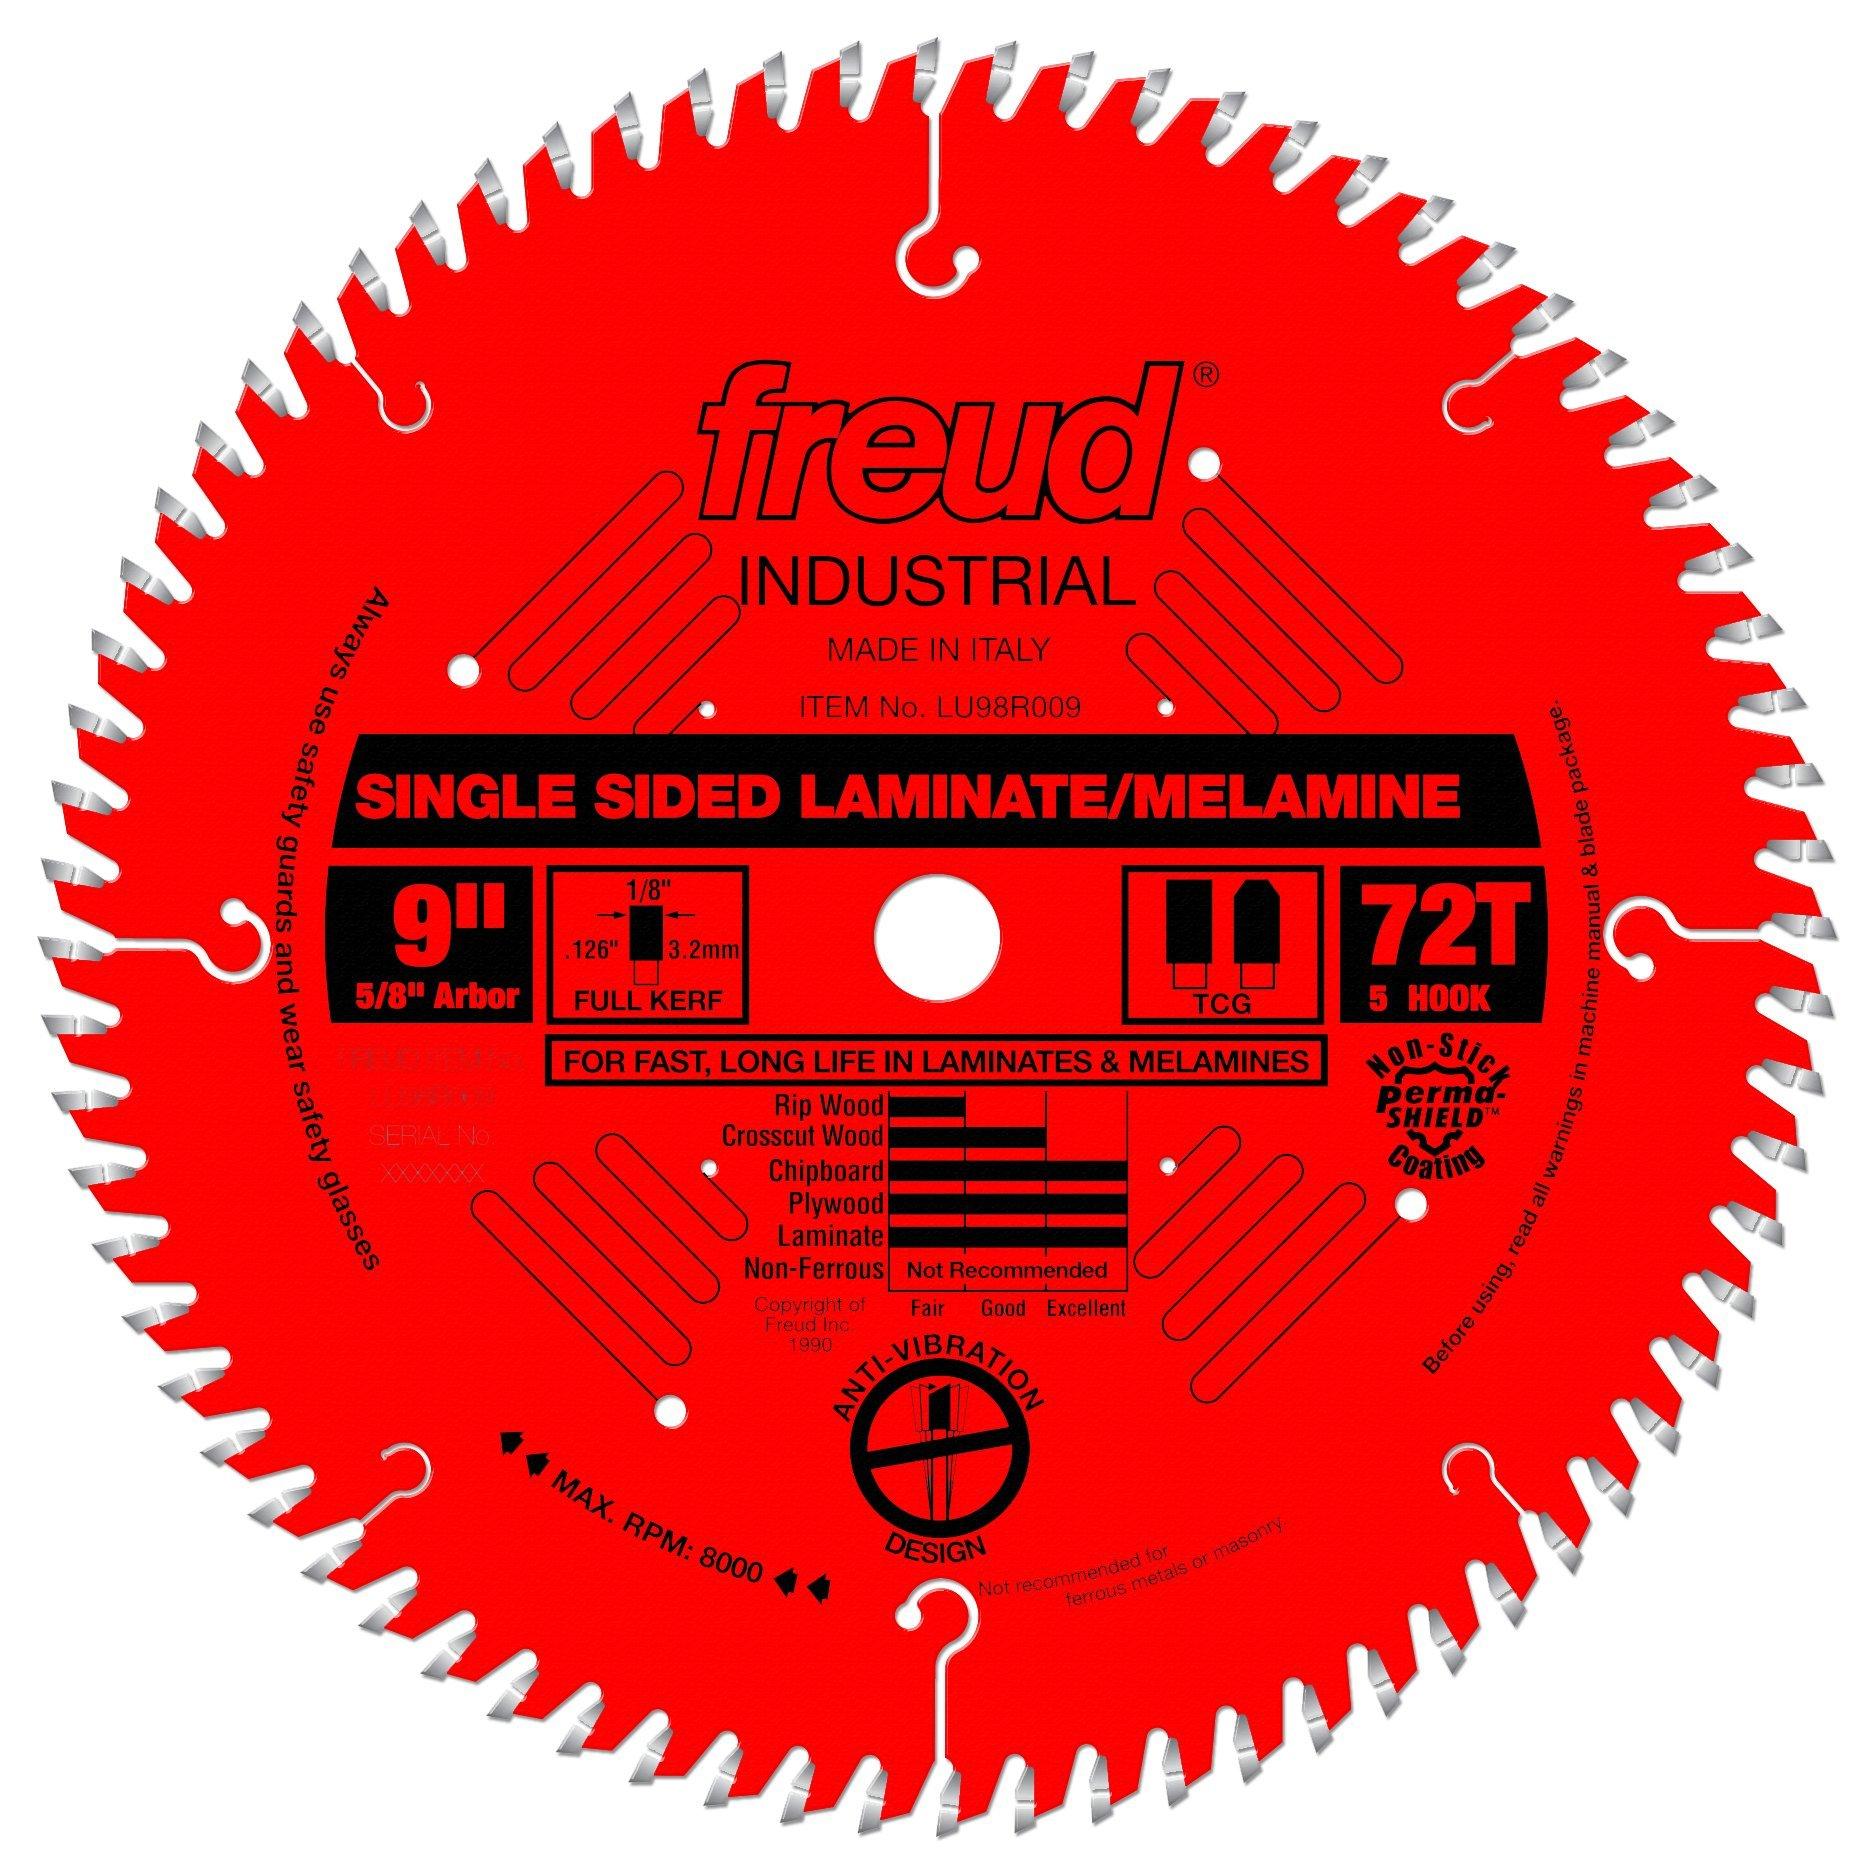 "Freud 9"" x 72T Single Sided Laminate/Melamine Blade (LU98R009)"